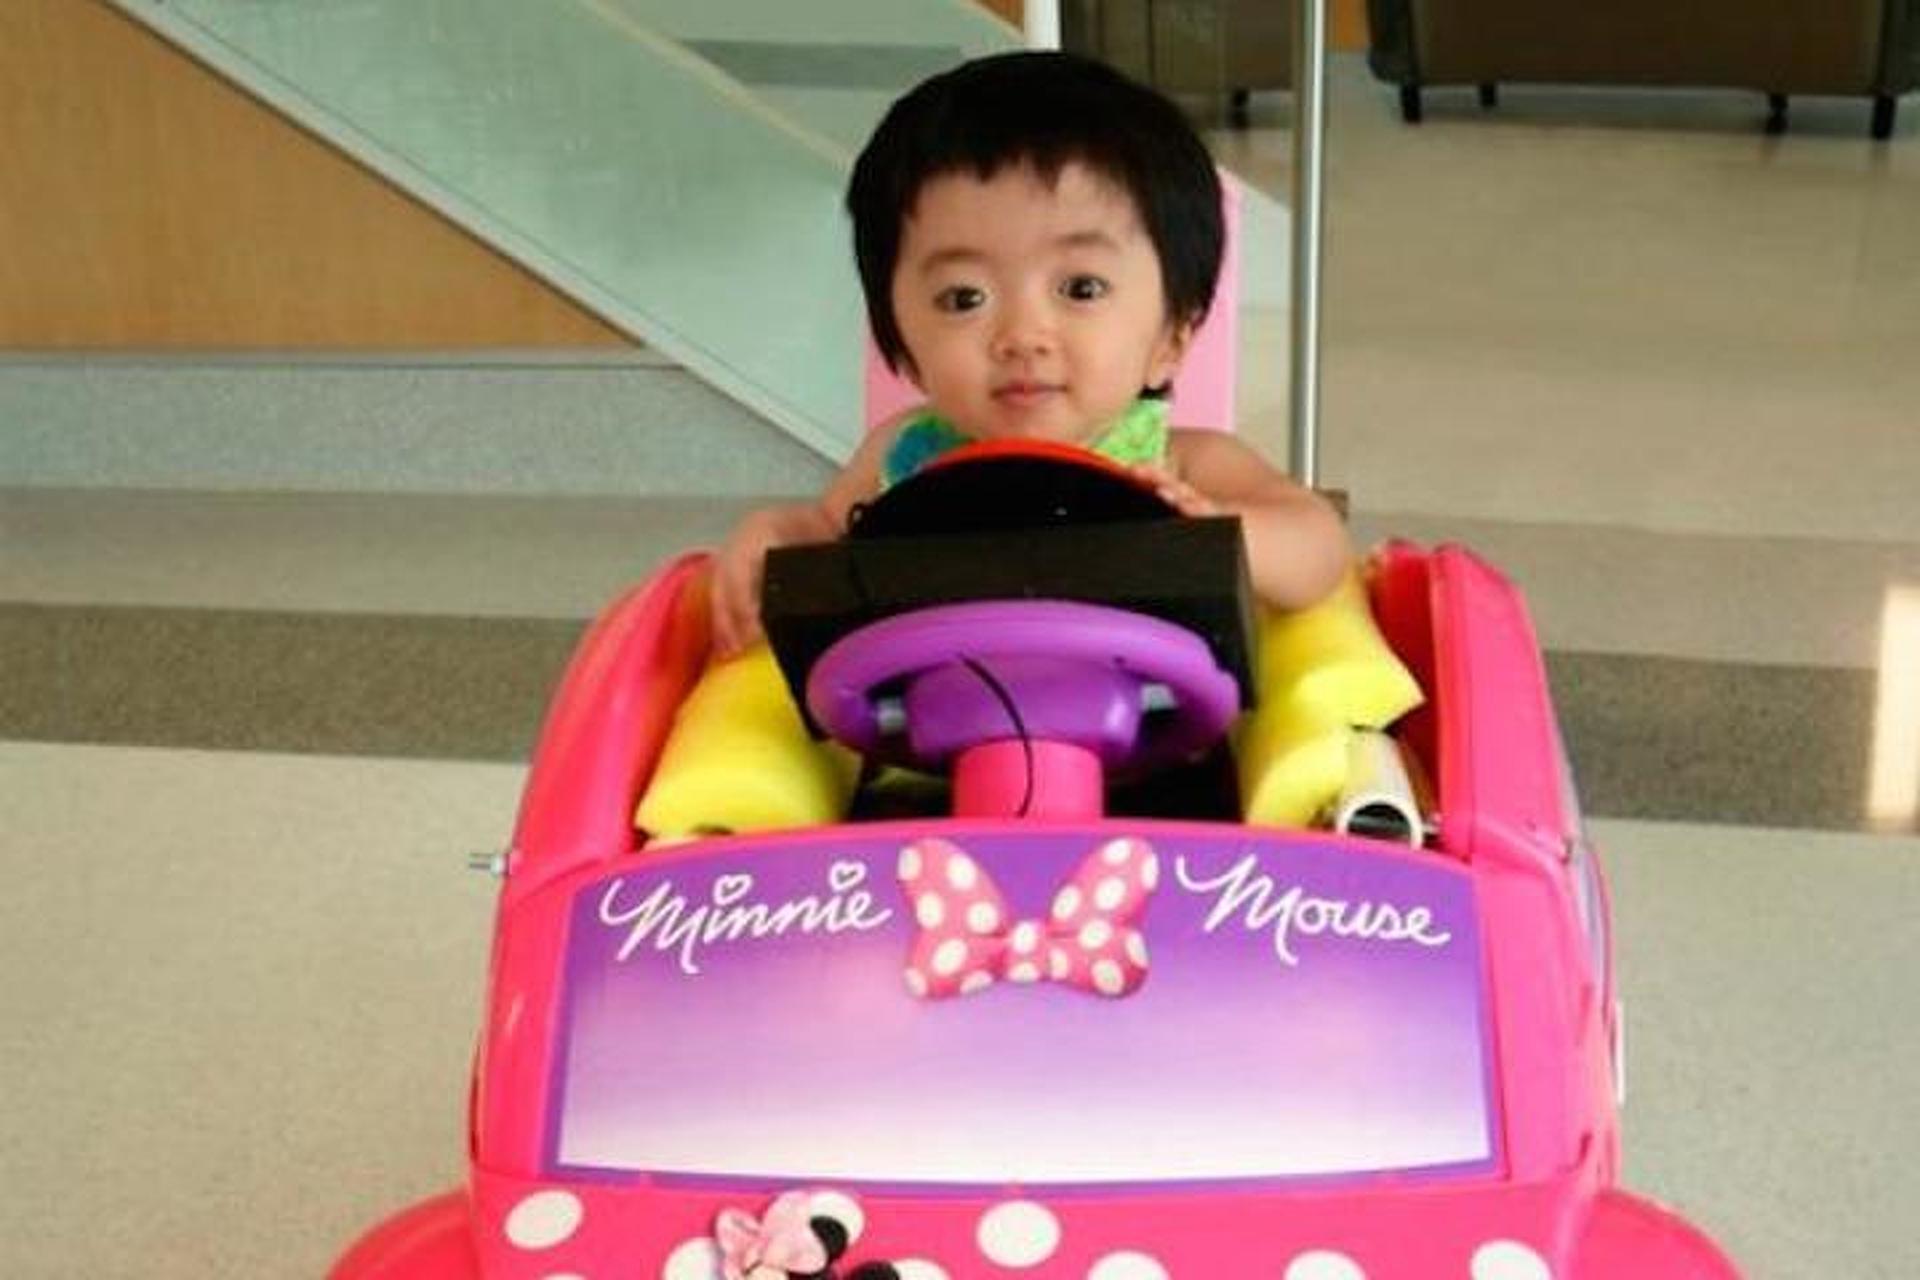 GoBabyGo Brings Affordable Mobility to Disabled Children